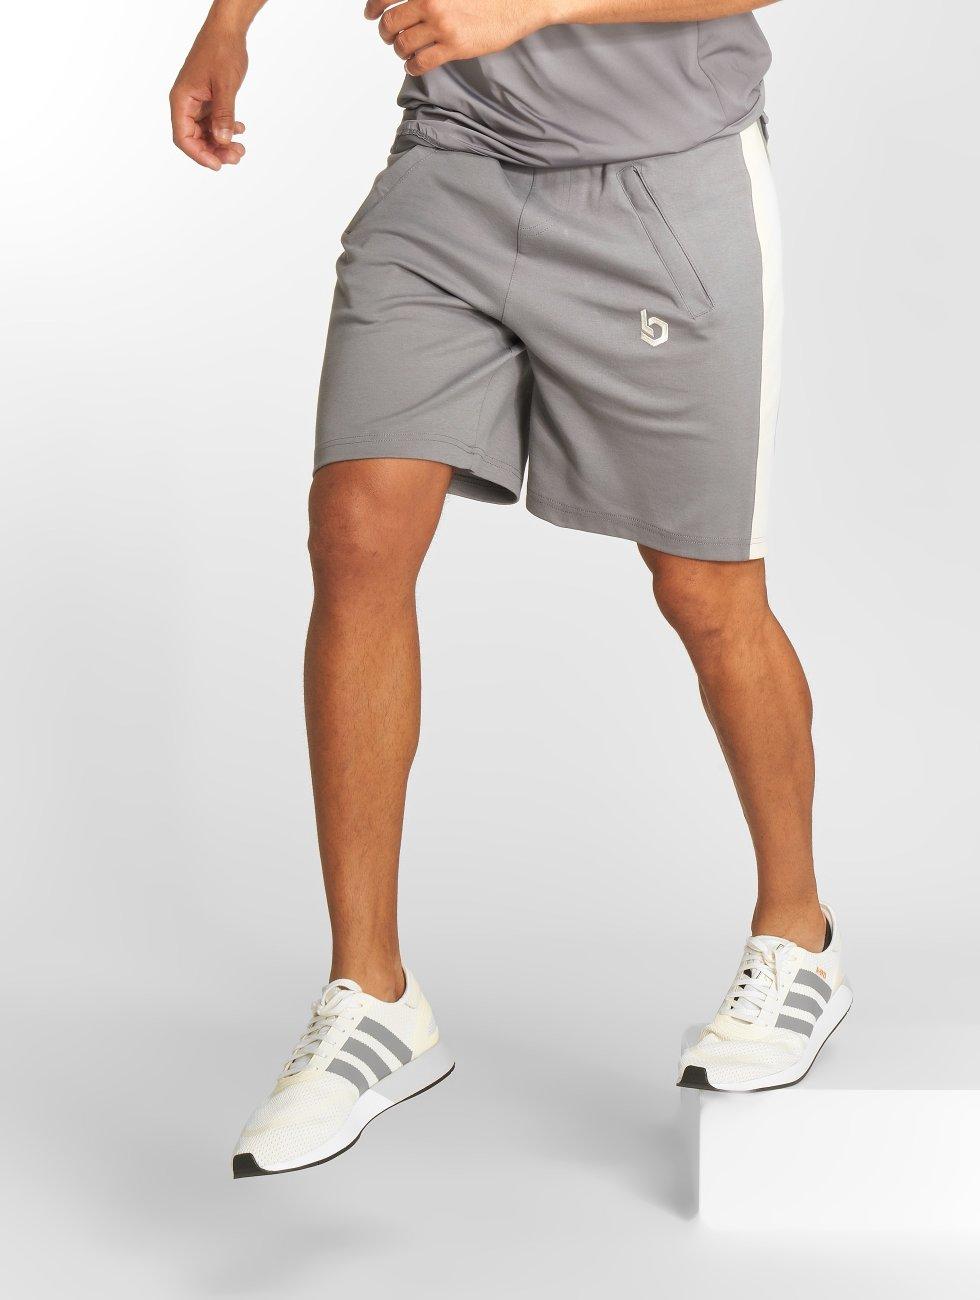 Beyond Limits Shorts Foundation grigio